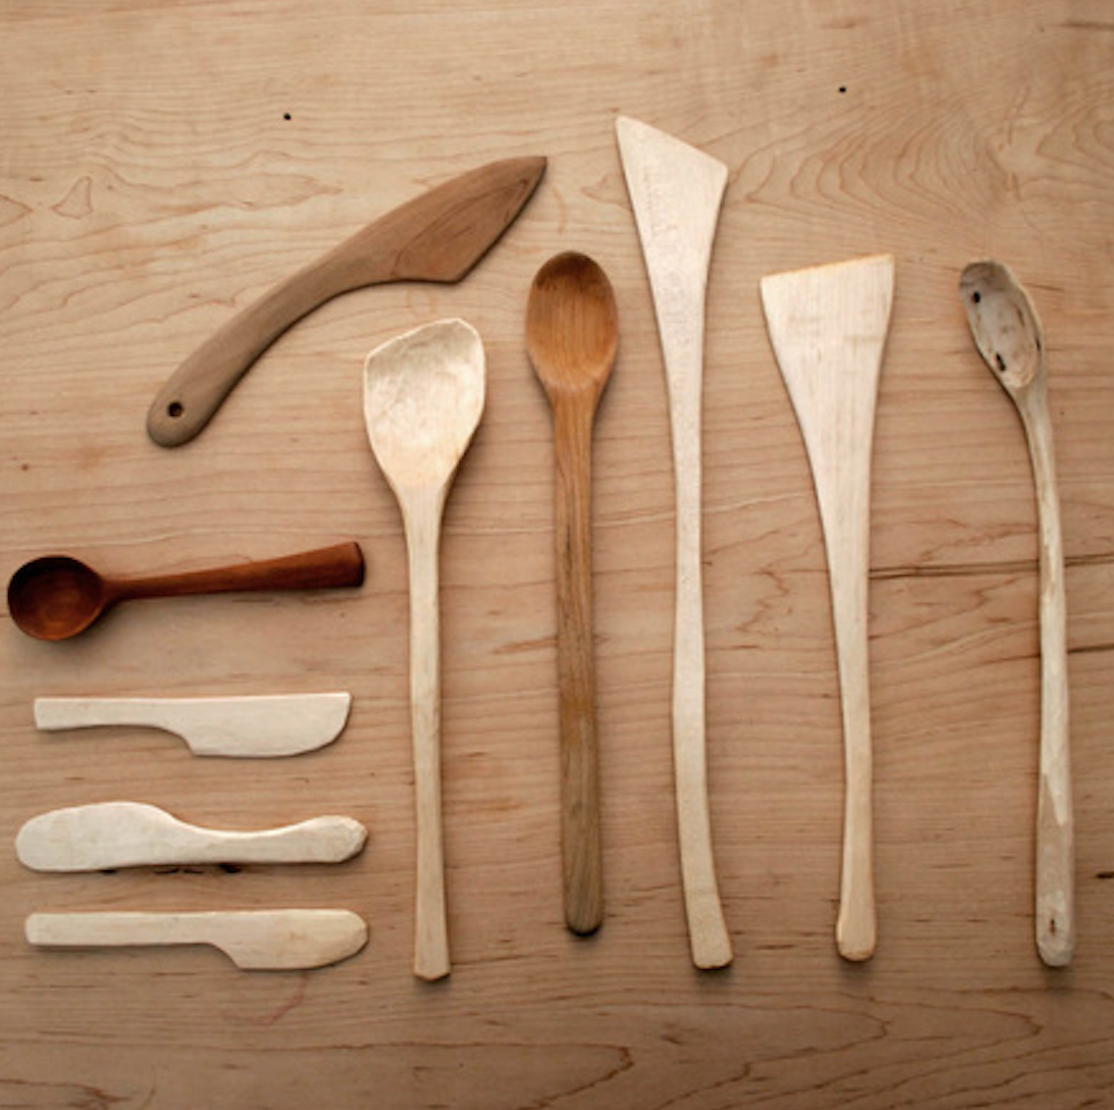 Prairie Mountain Folk School - Joseph, Oregon - Carving the Wooden Spoon